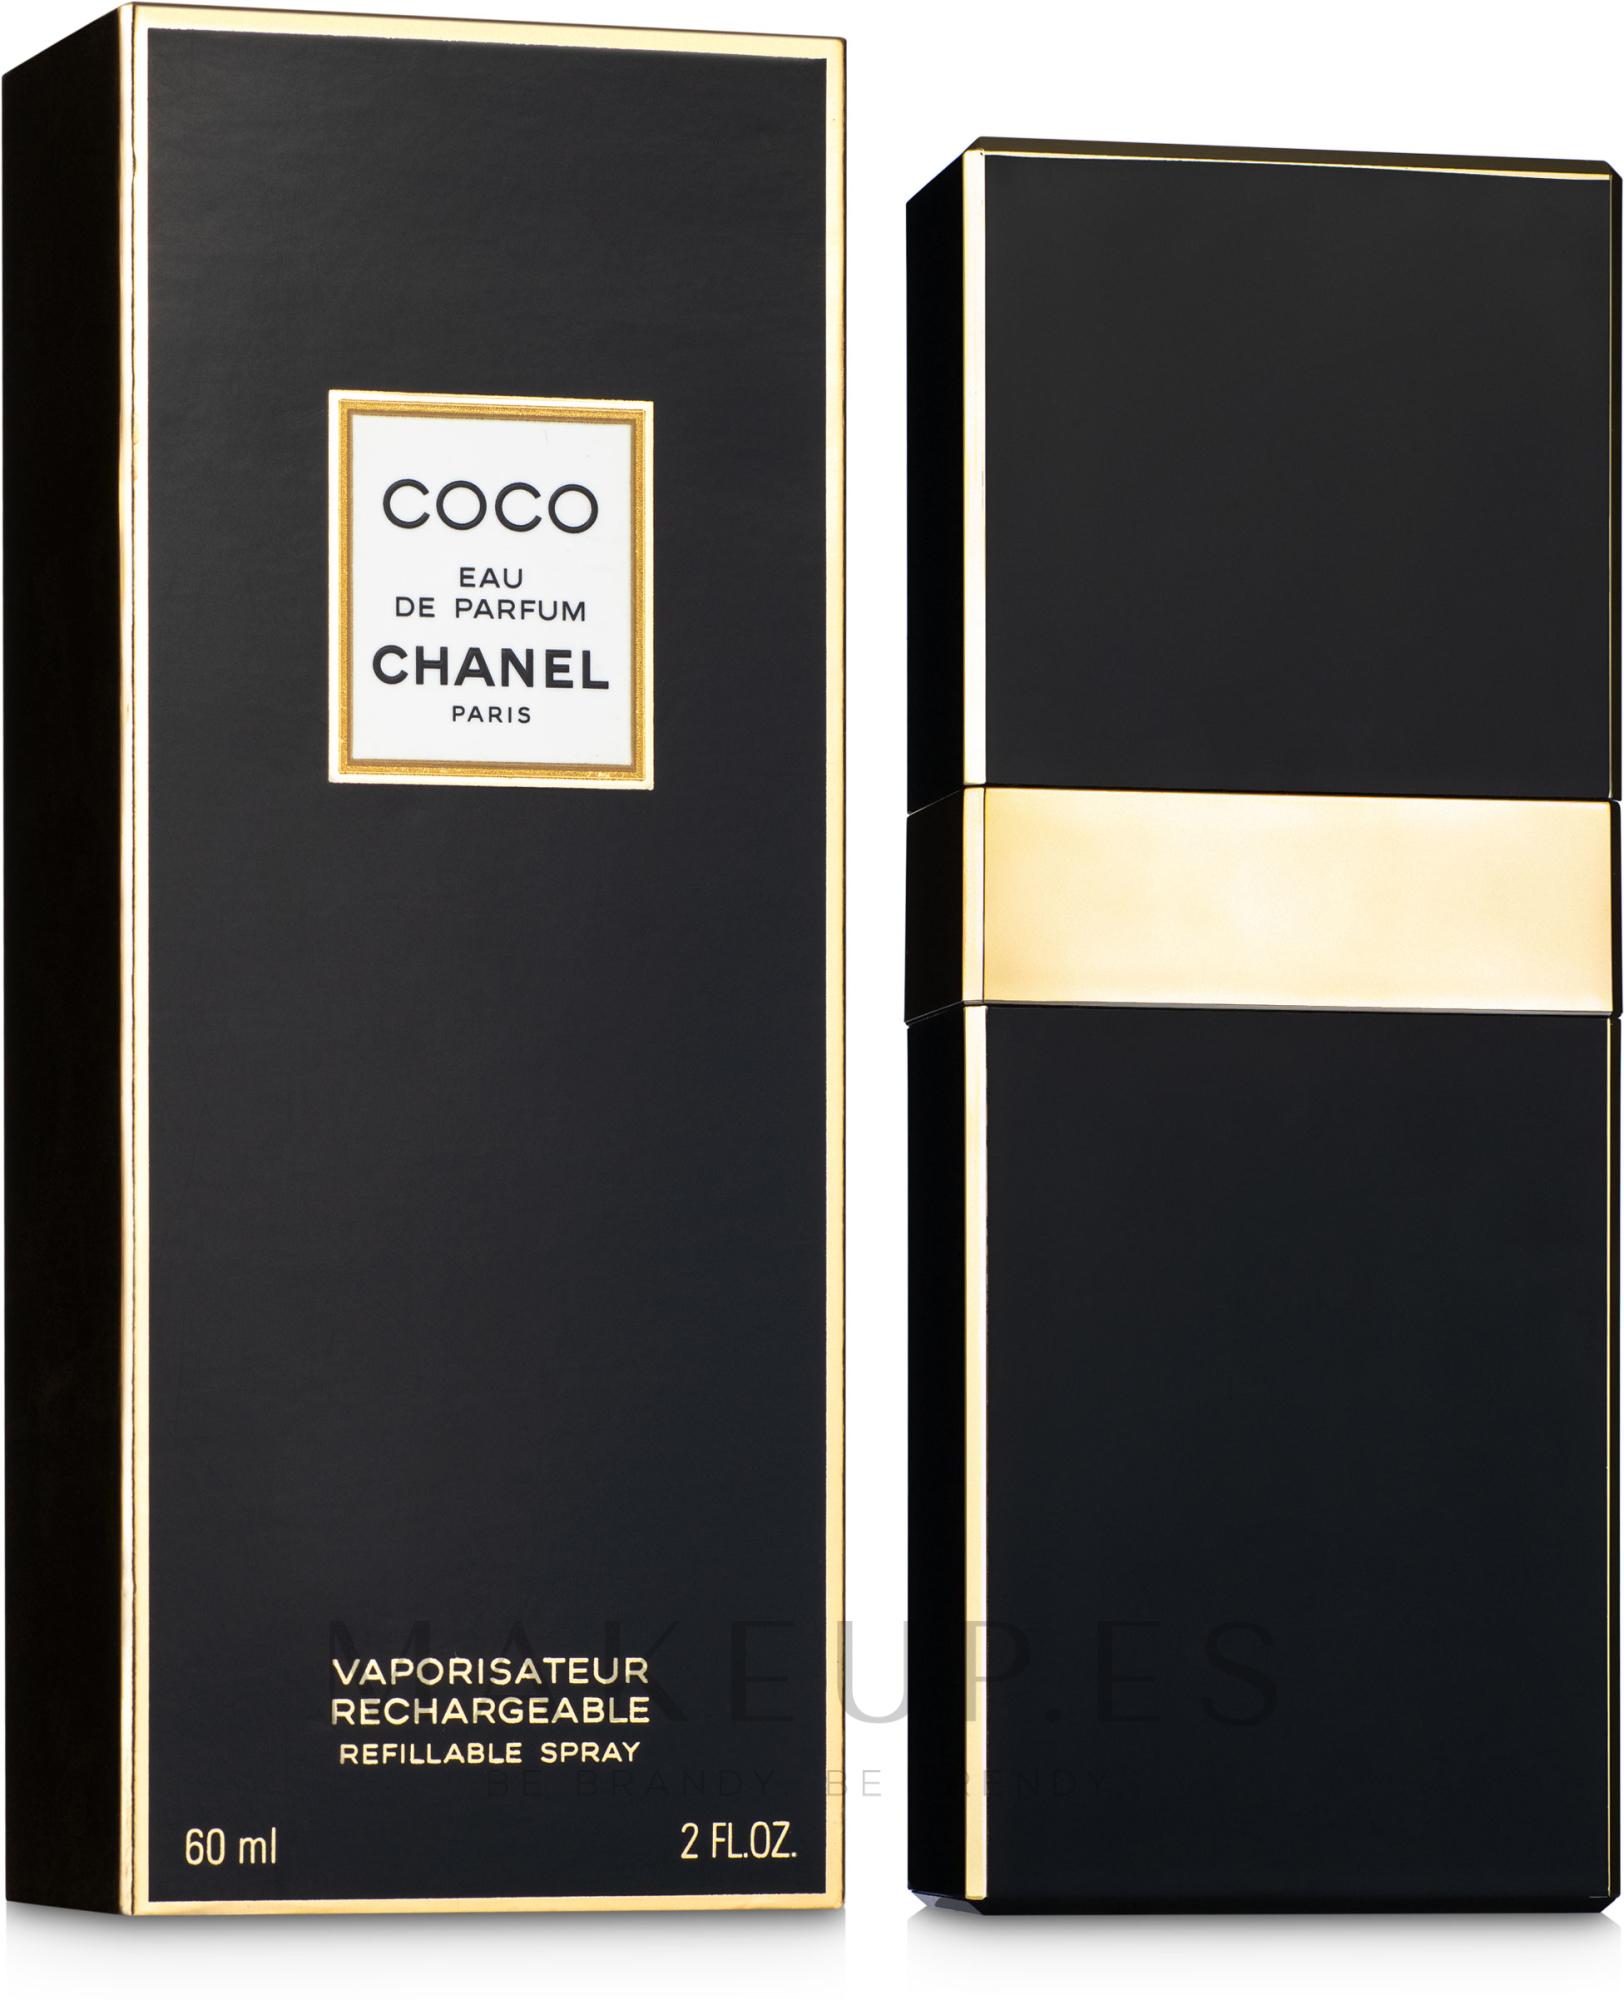 Chanel Coco - Eau de Parfum (relleno) — imagen 60 ml